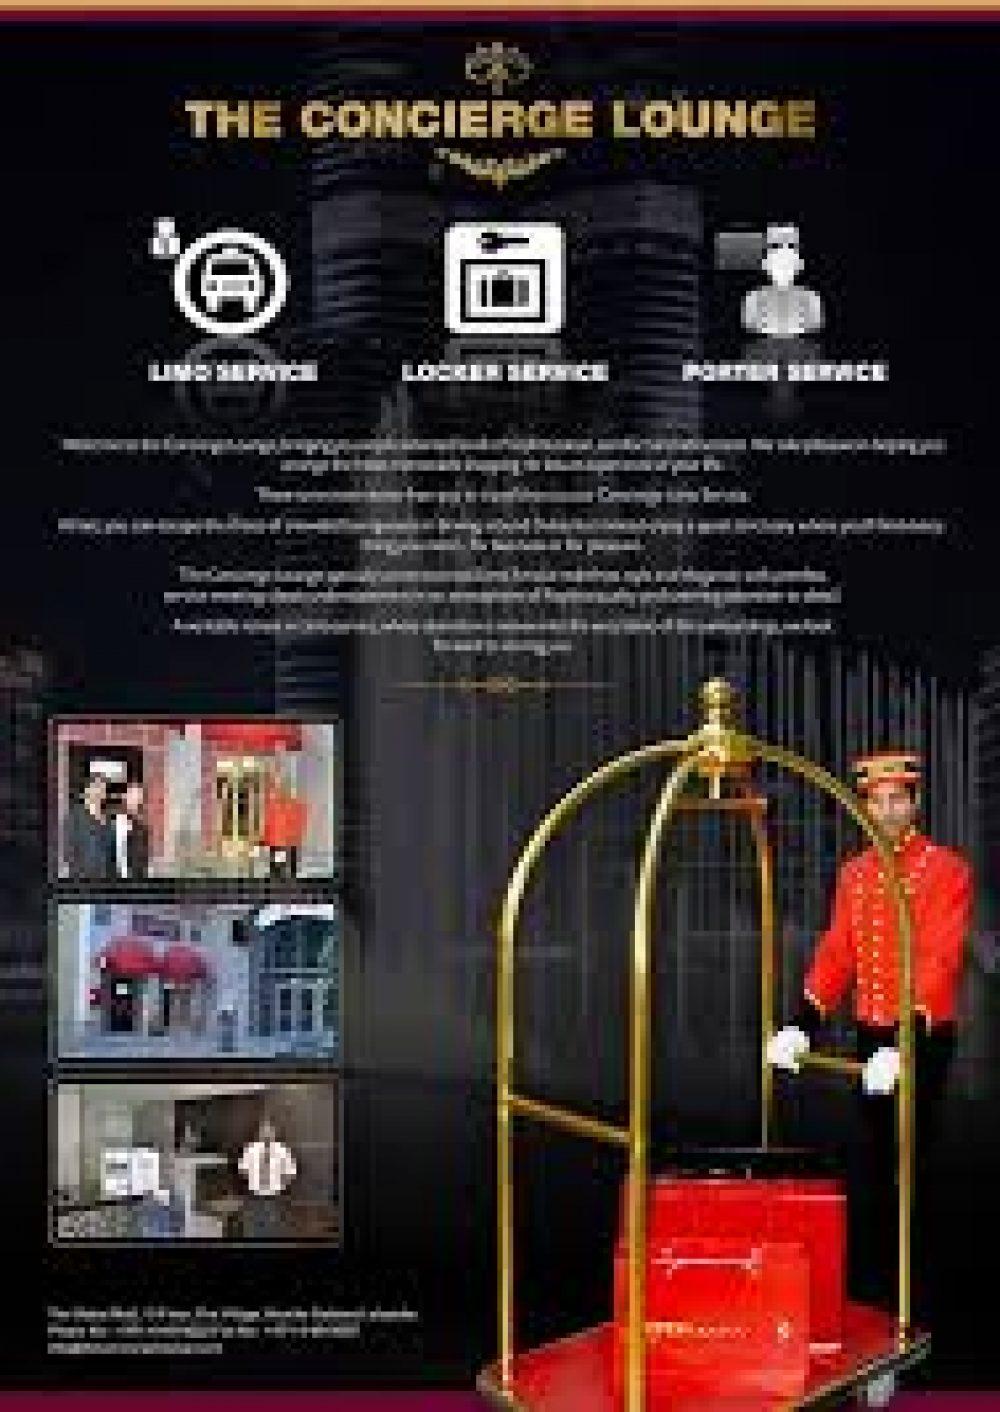 Concierge Lounge Dubai Shopping Guide